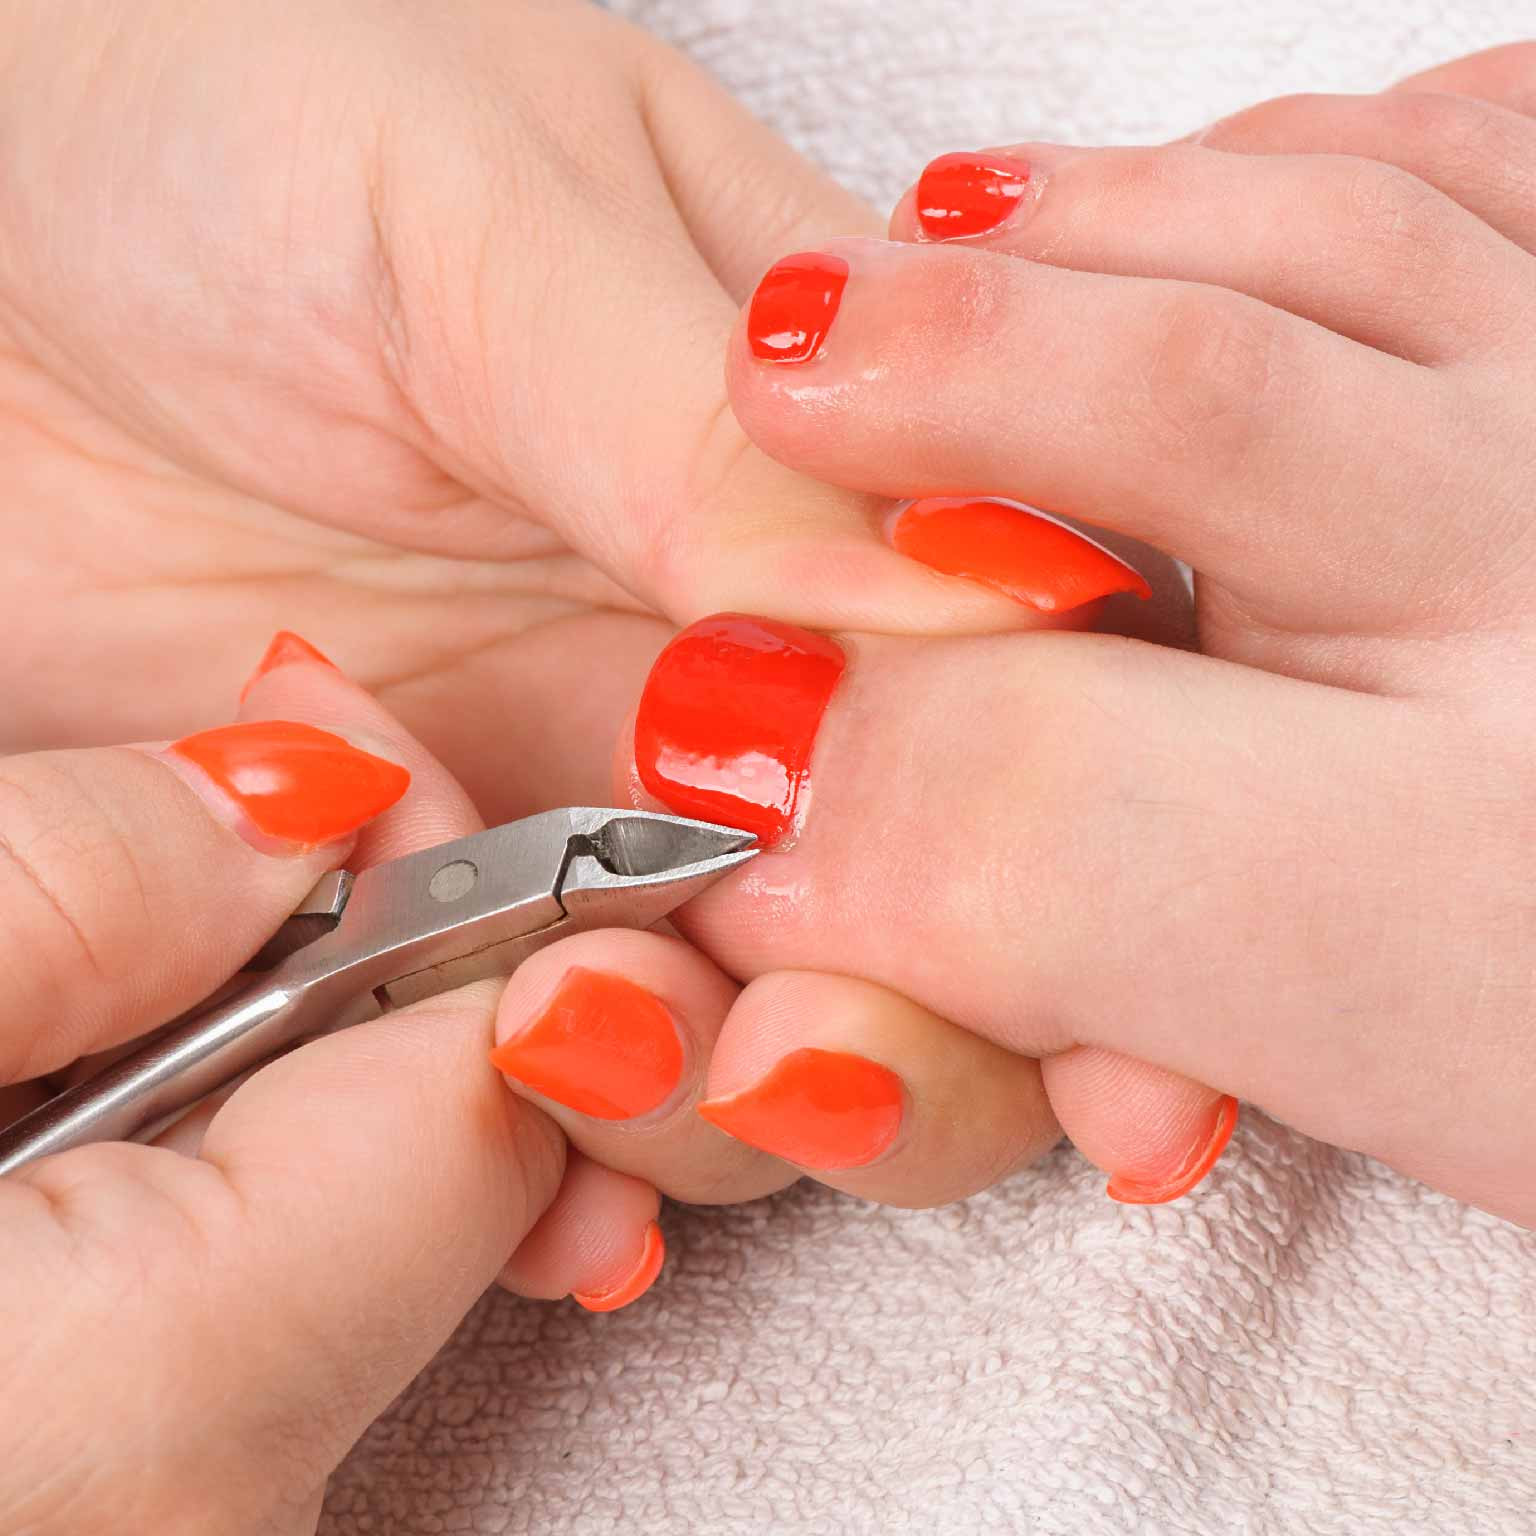 Cuticle Trim Feet